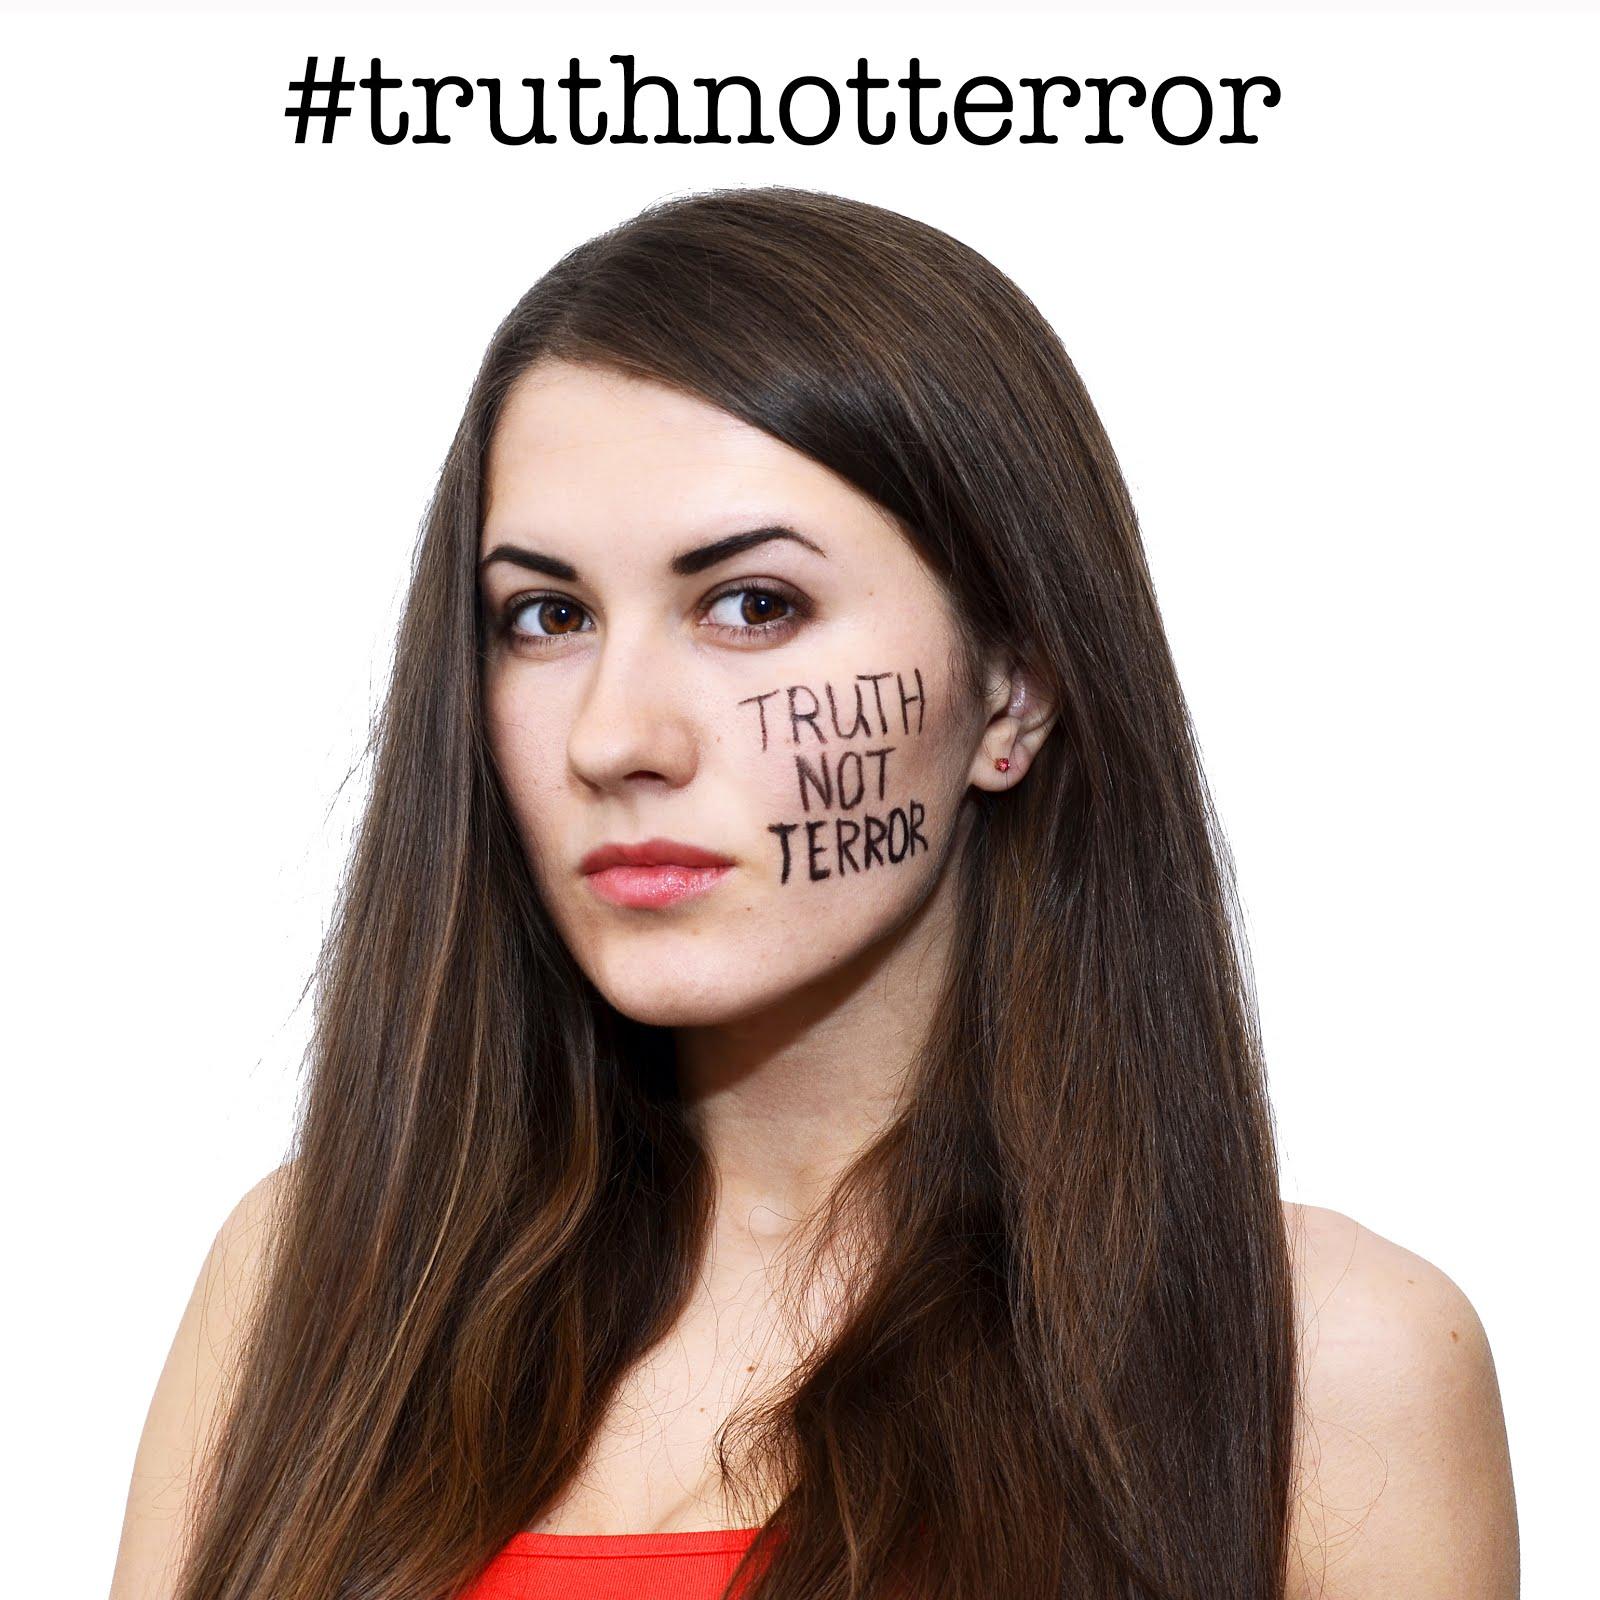 #truthnotterror